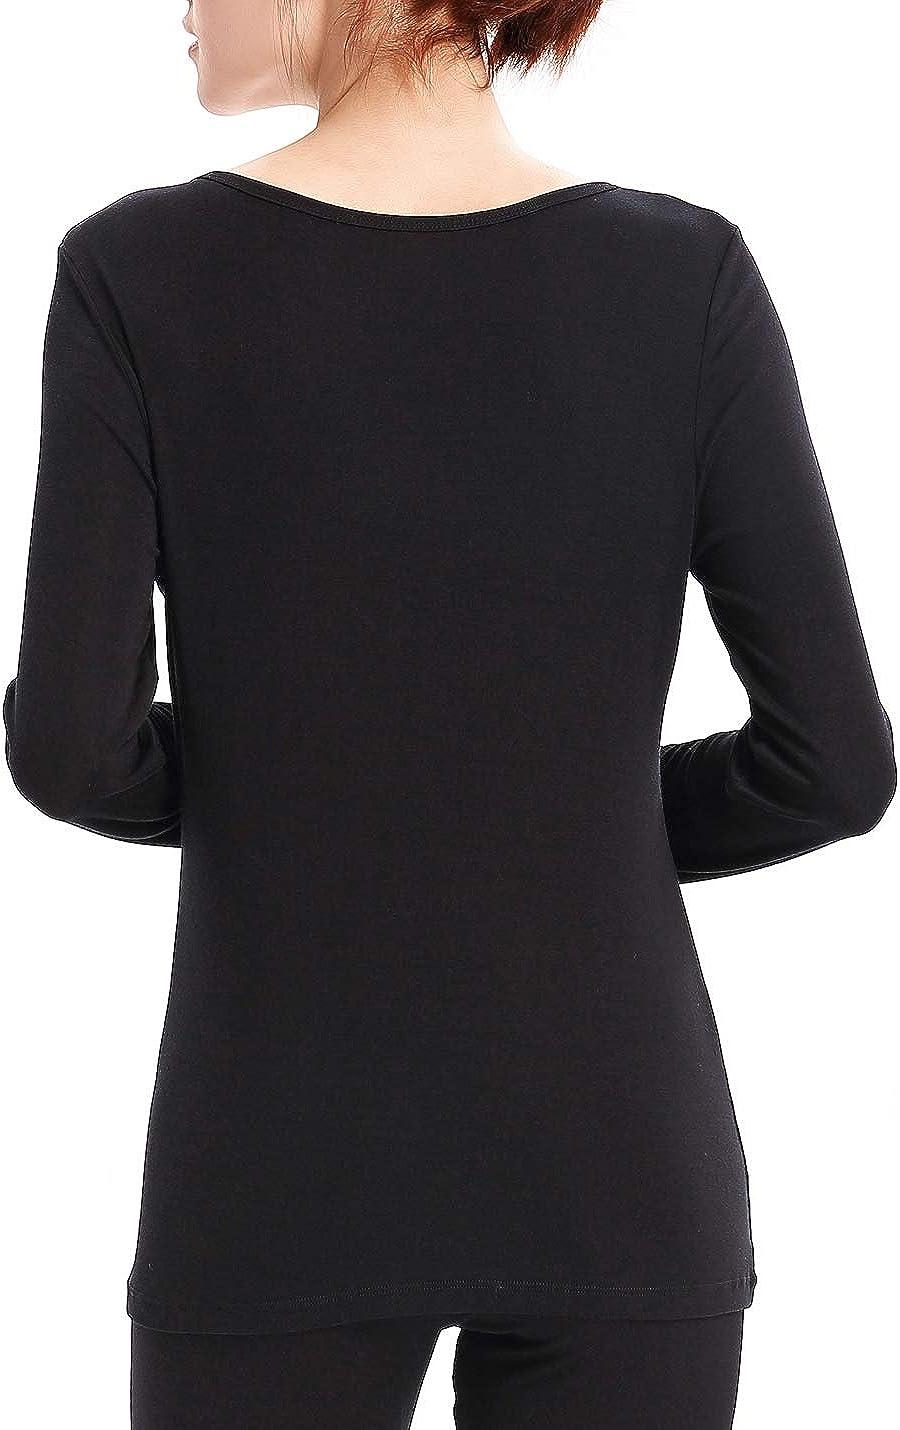 Liqqy Womens Scoop Neck Ultra Thin Long-Sleeve Thermal Underwear Shirt Tops